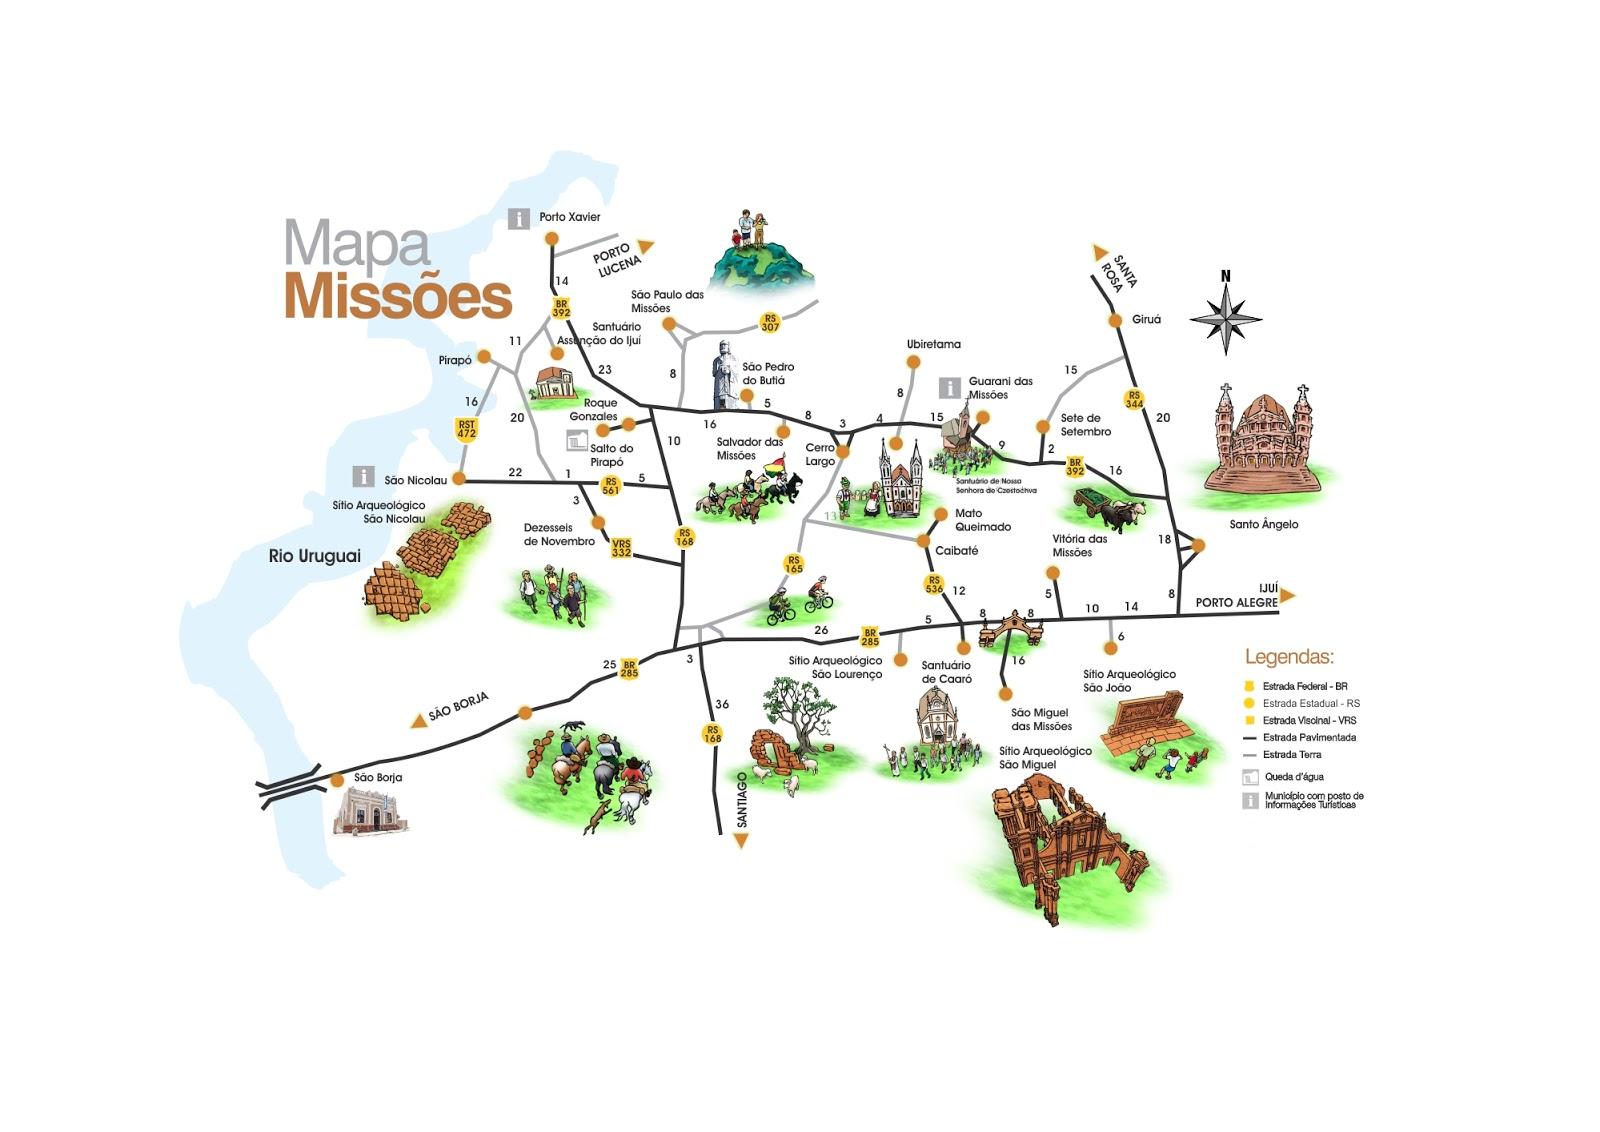 Mapa das Missões Jesuíticas